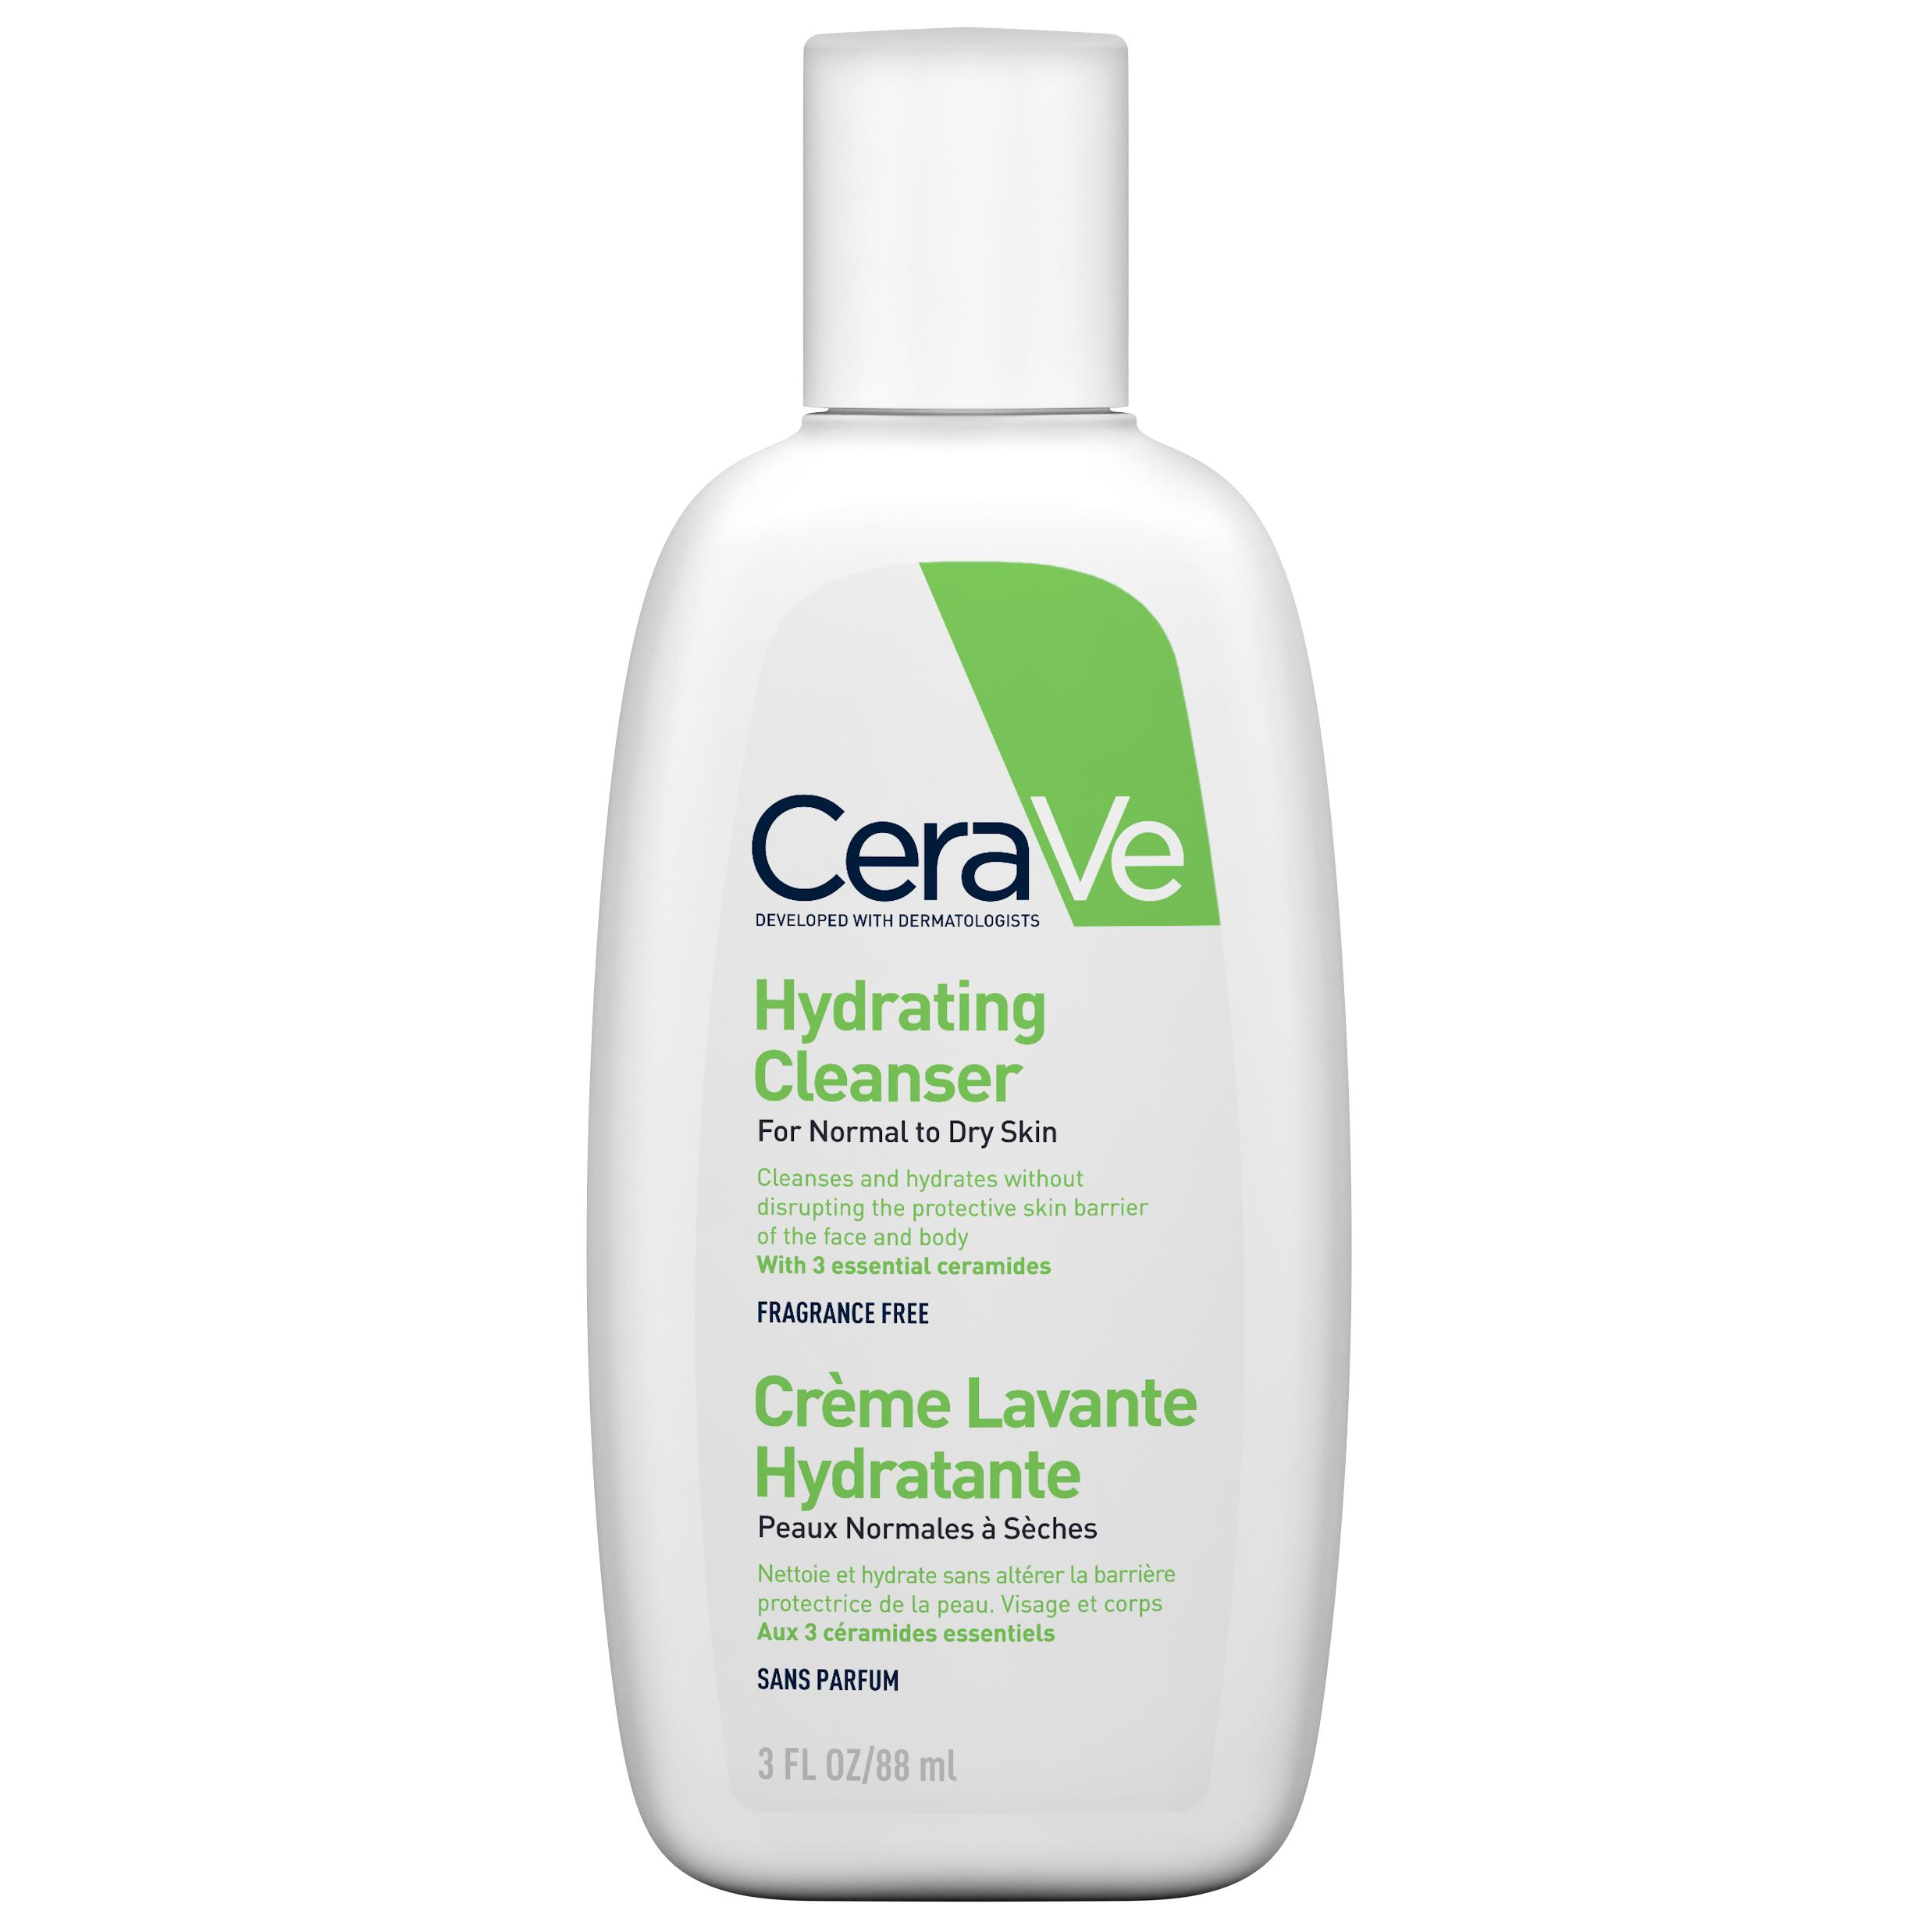 Image of Cerave crème lavante hydratante